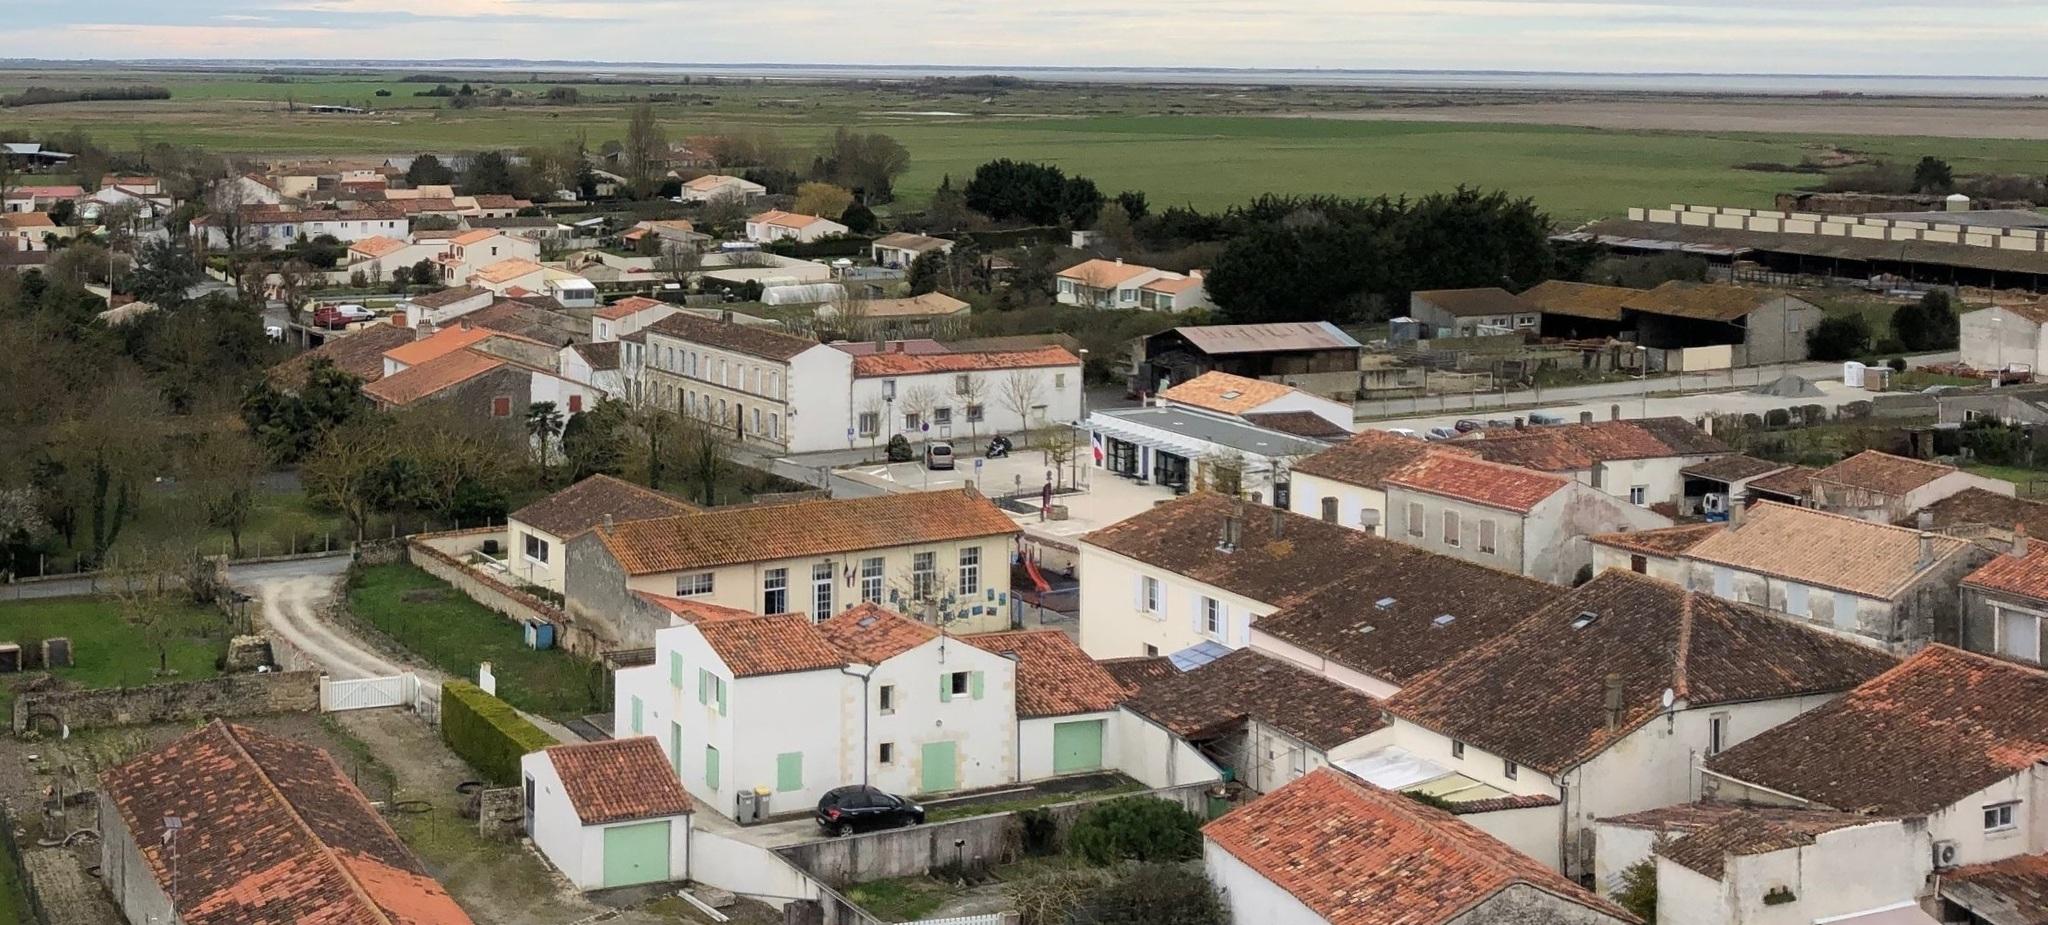 Department of la Charente-Maritime, France